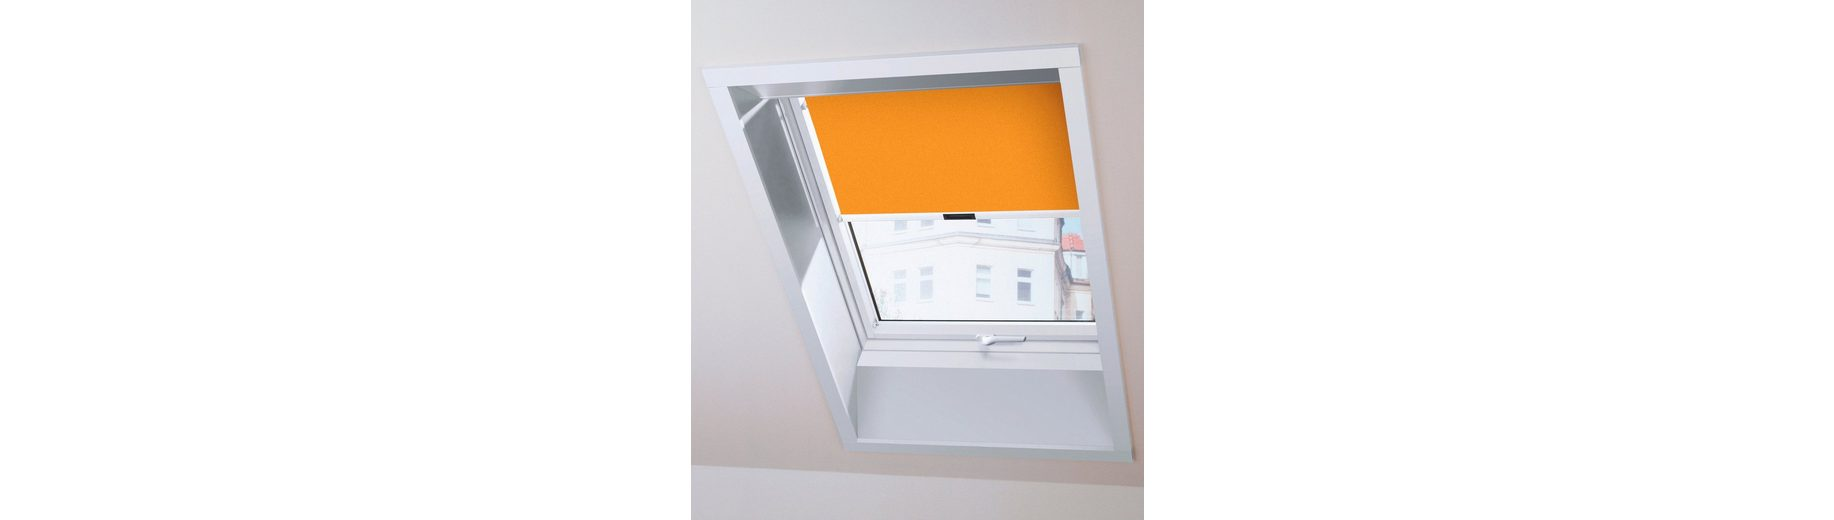 Dachfenster »PTP U3«, BxH: 55x78 cm